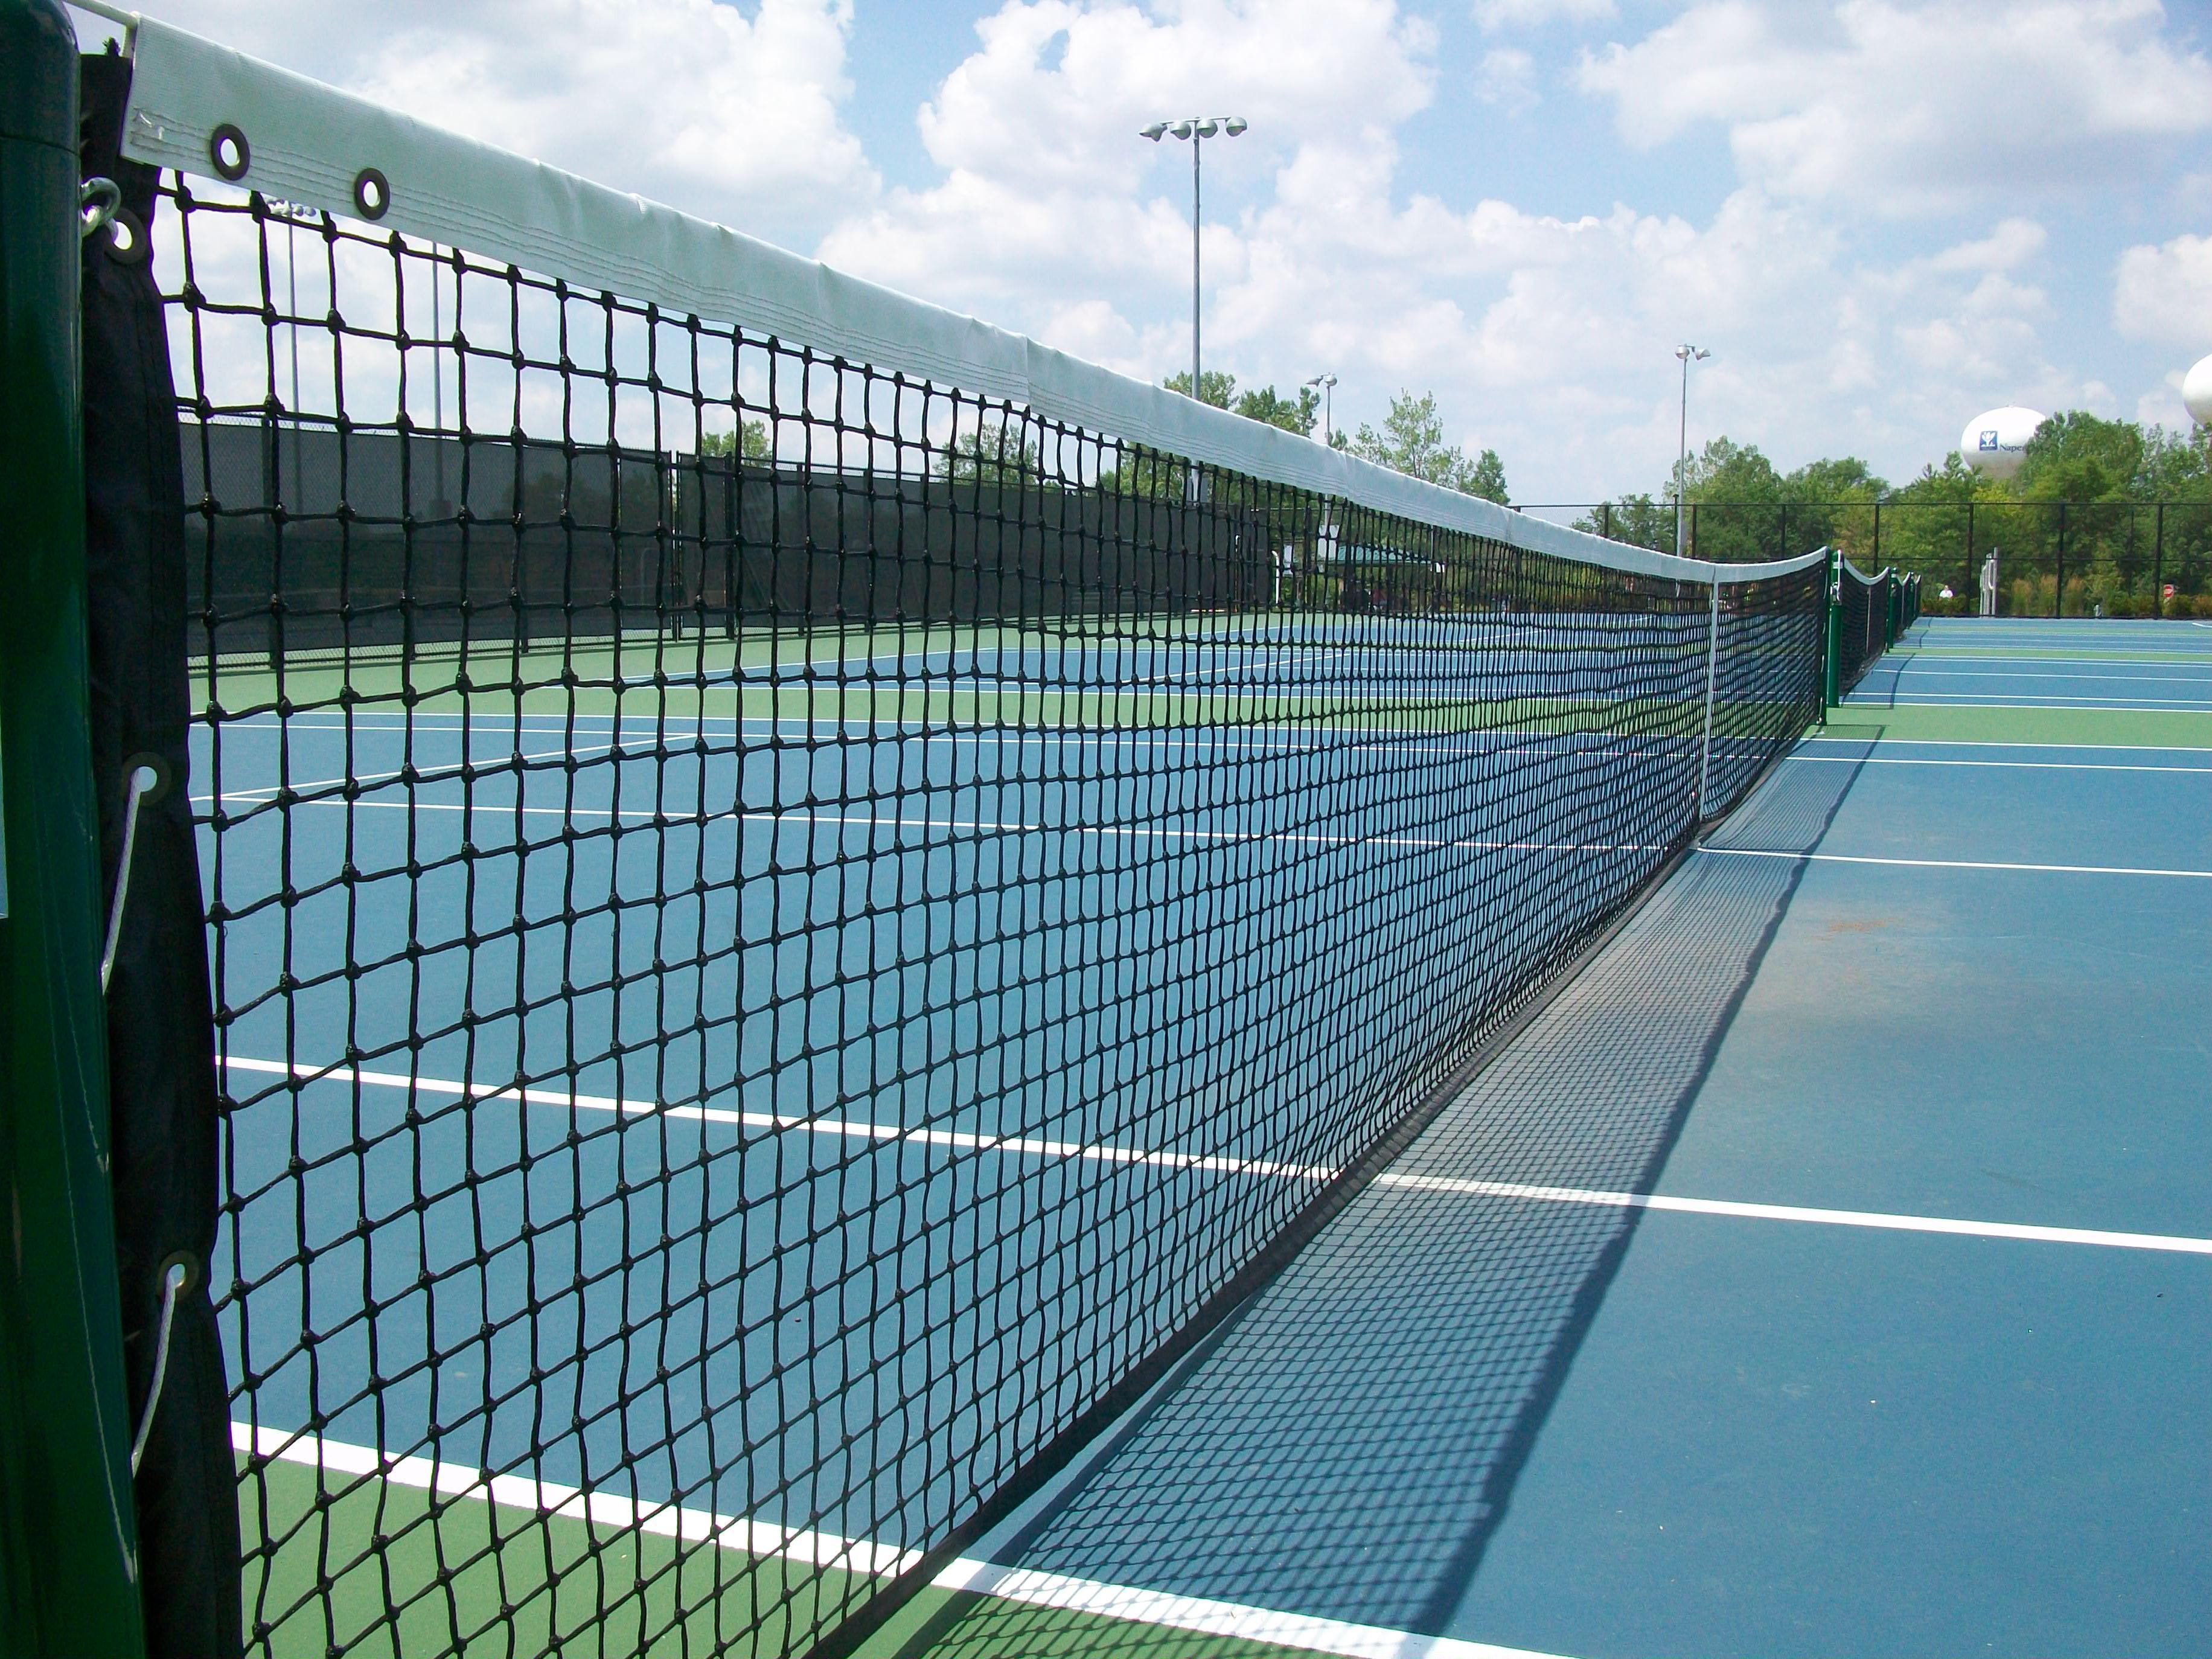 Tennisnet  Experts in Tennis